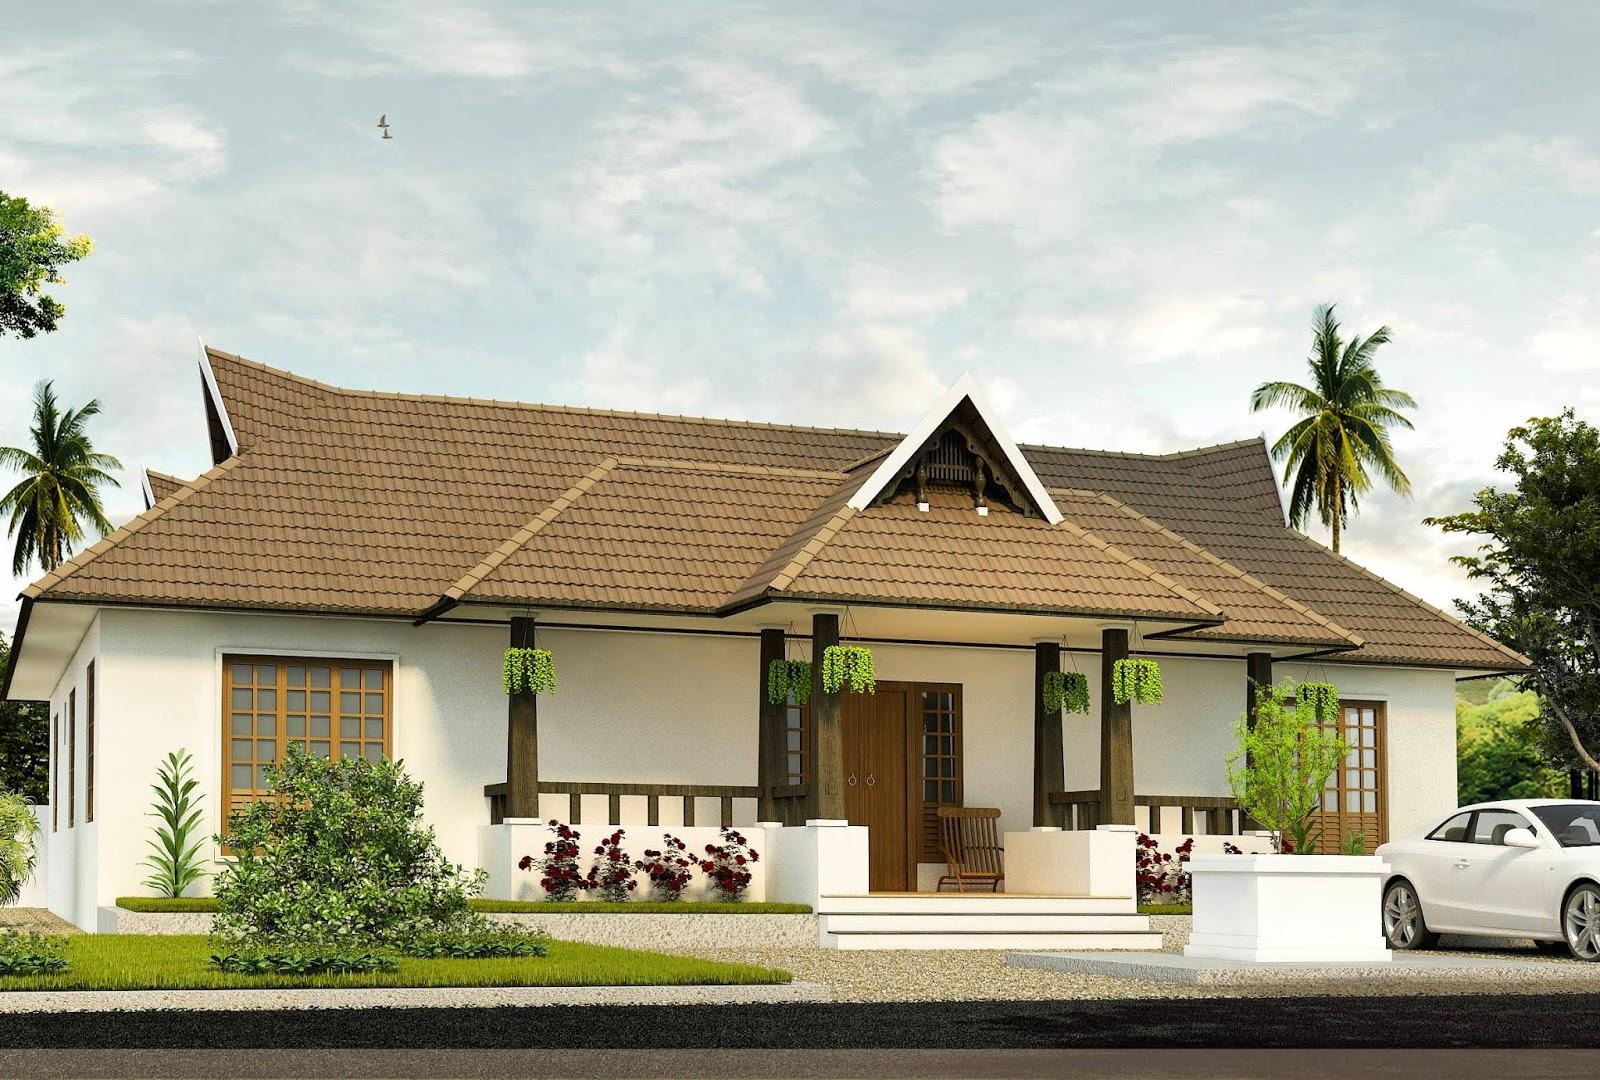 Heritage Homes The Nalukettu Houses of Kerala Forms4 Kochi